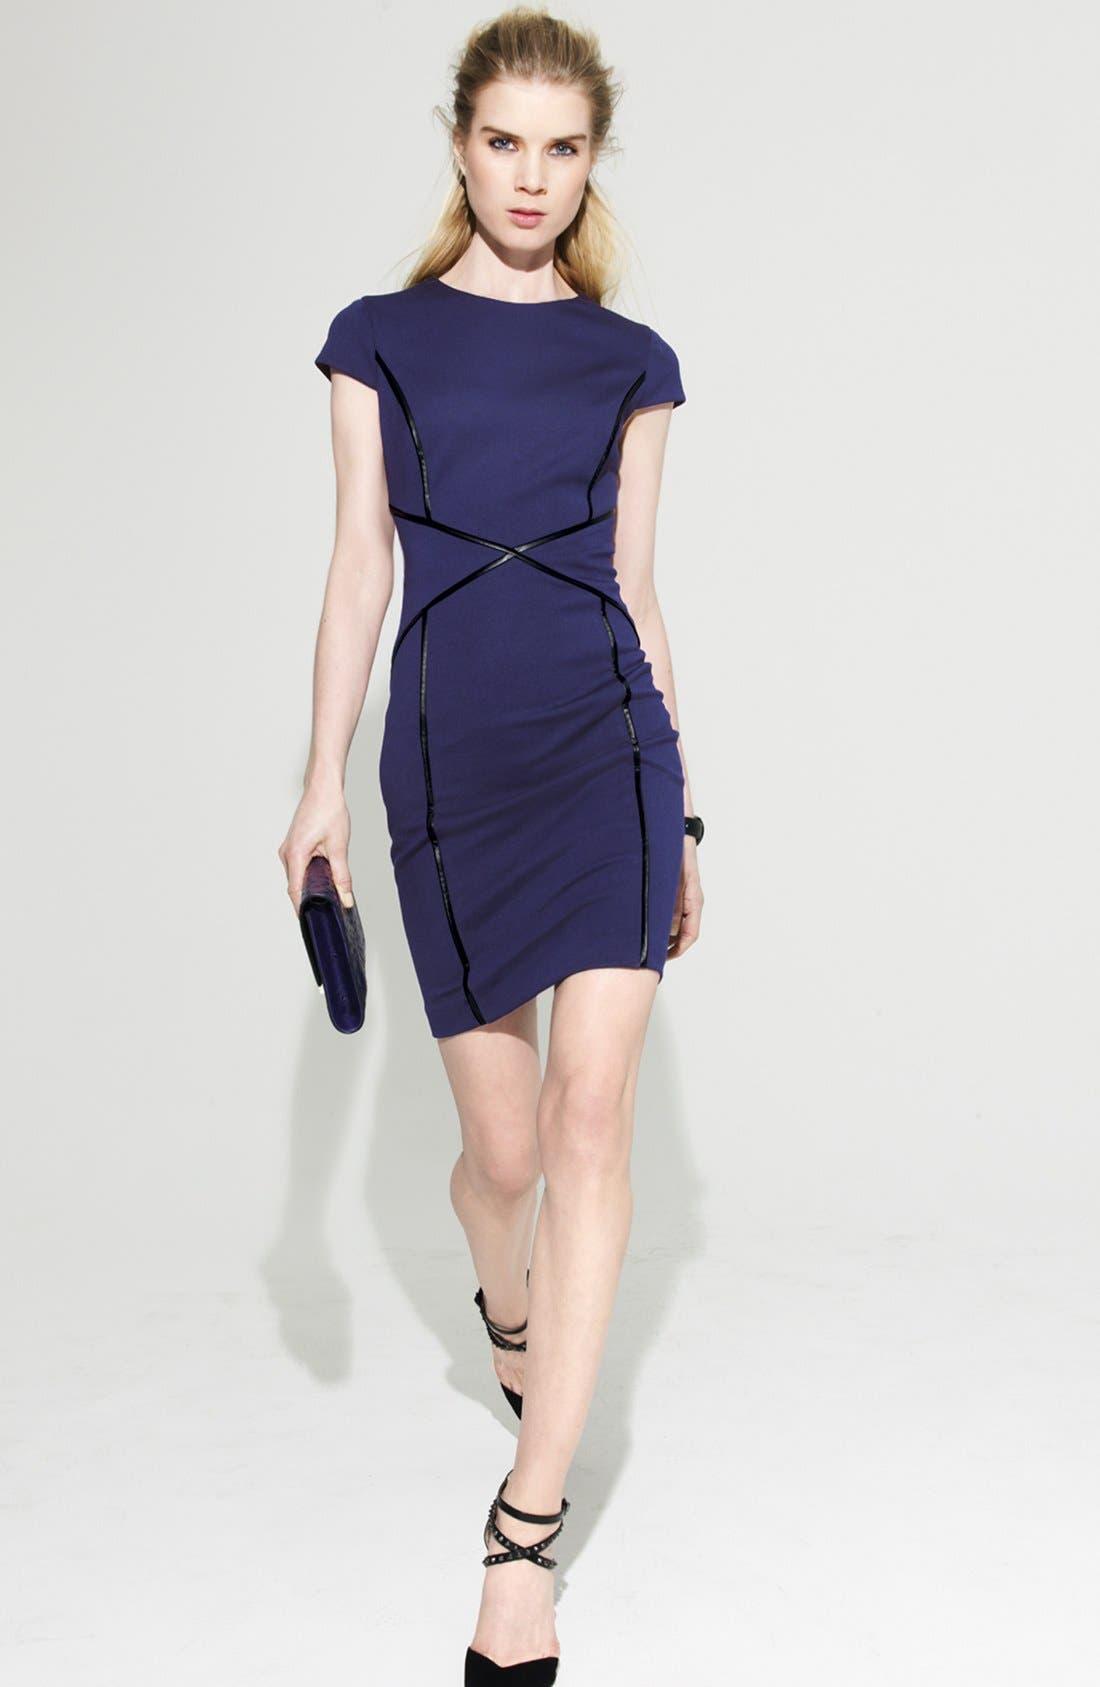 Alternate Image 1 Selected - Cynthia Steffe Sheath Dress & Accessories